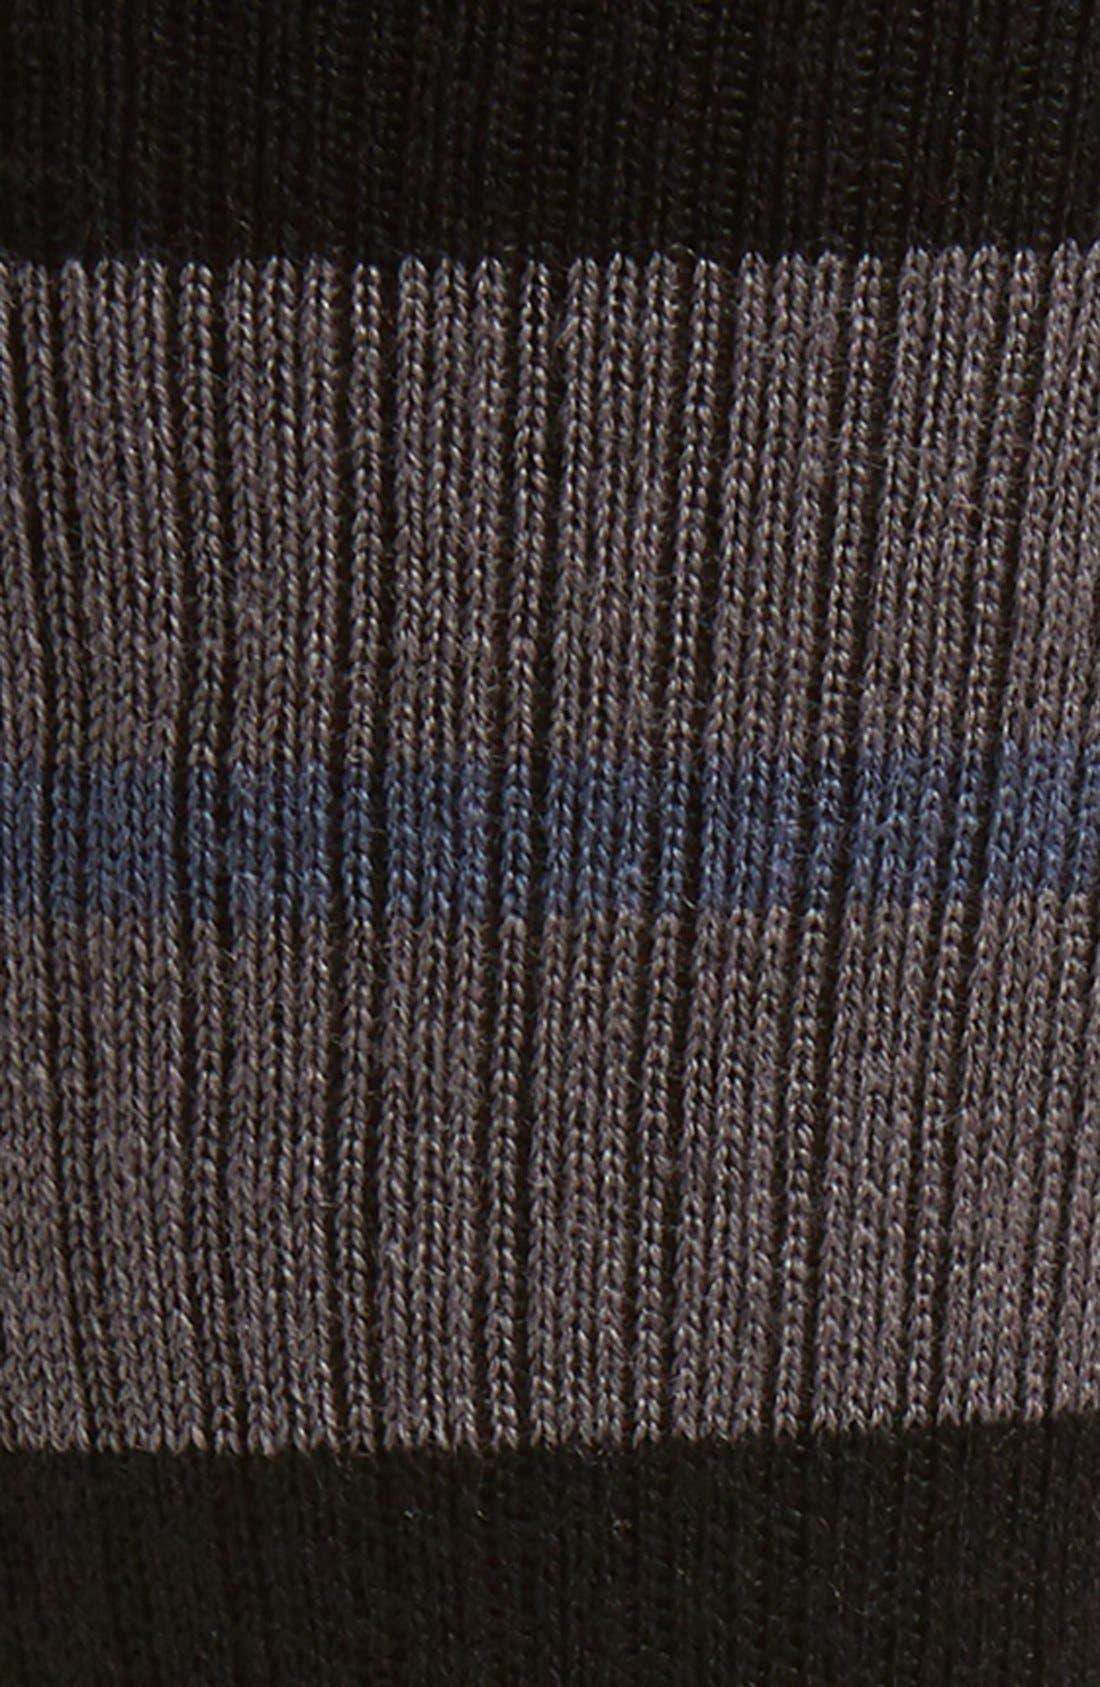 Sequoia Classic Crew Socks,                             Alternate thumbnail 2, color,                             Black